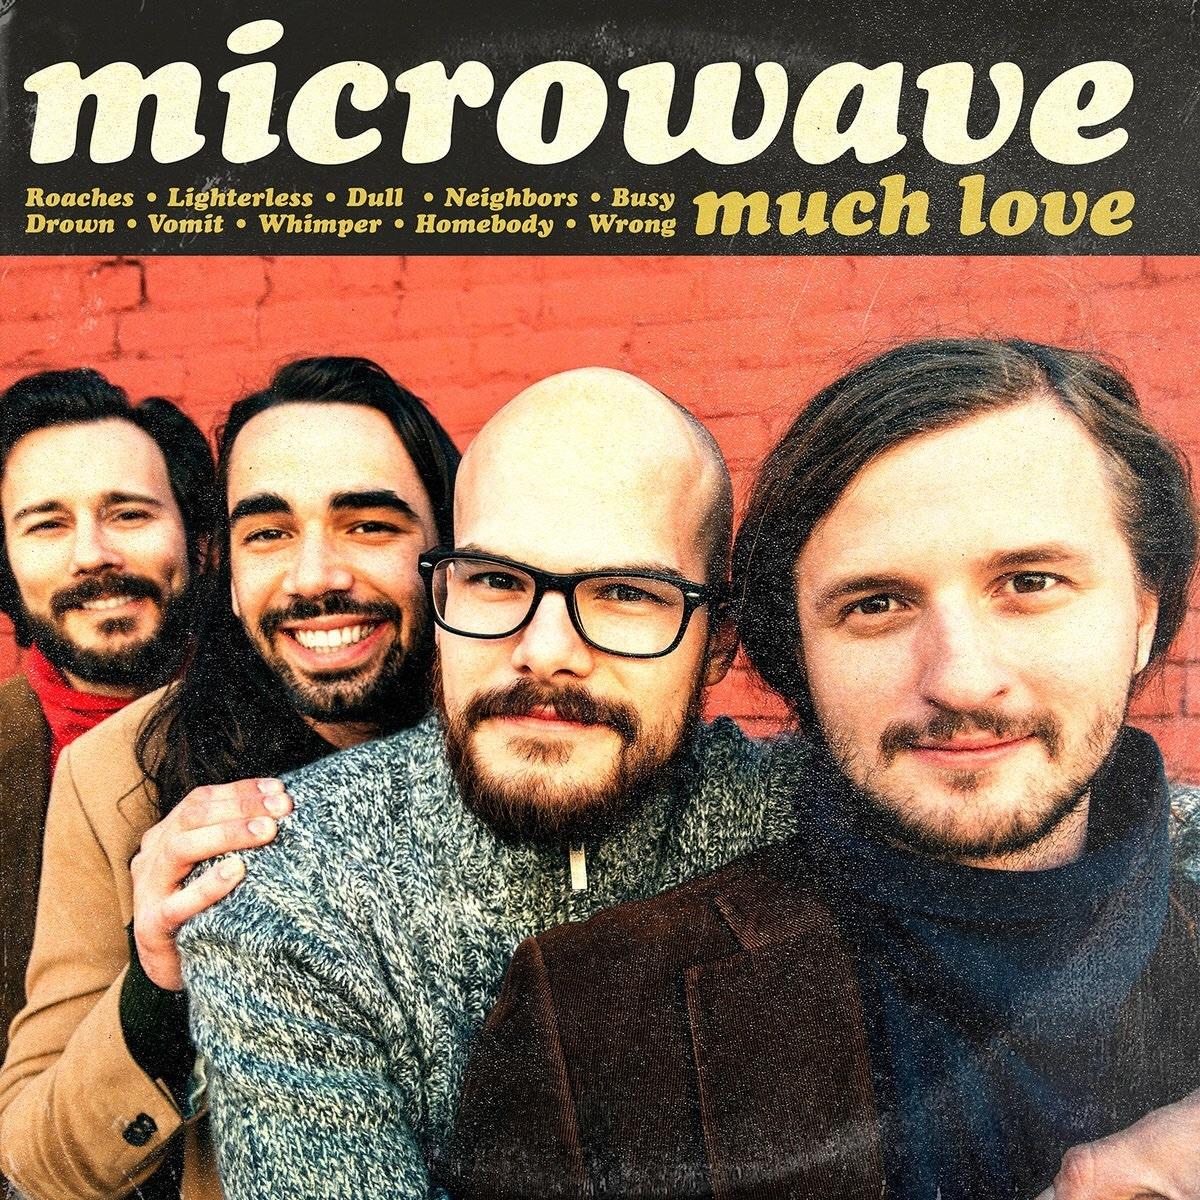 album, Microwave, and pop punk image